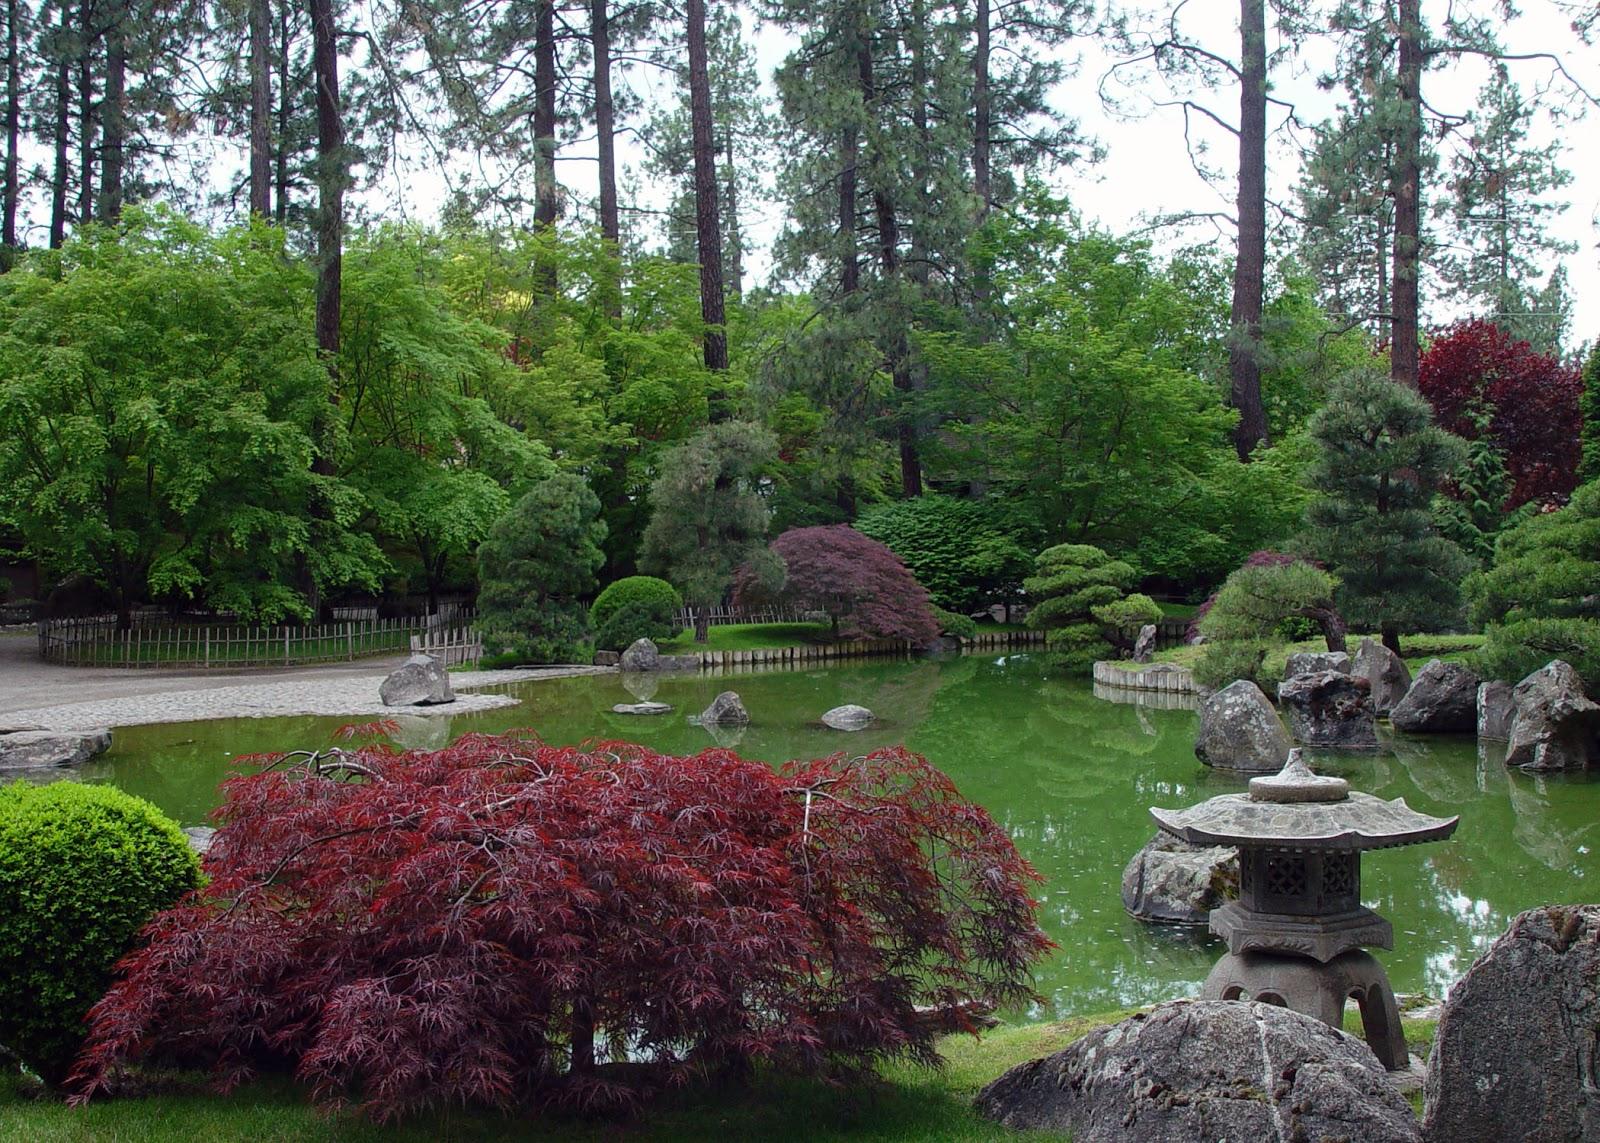 Eden by the bay nishinomiya japanese garden for Nishinomiya tsutakawa japanese garden koi